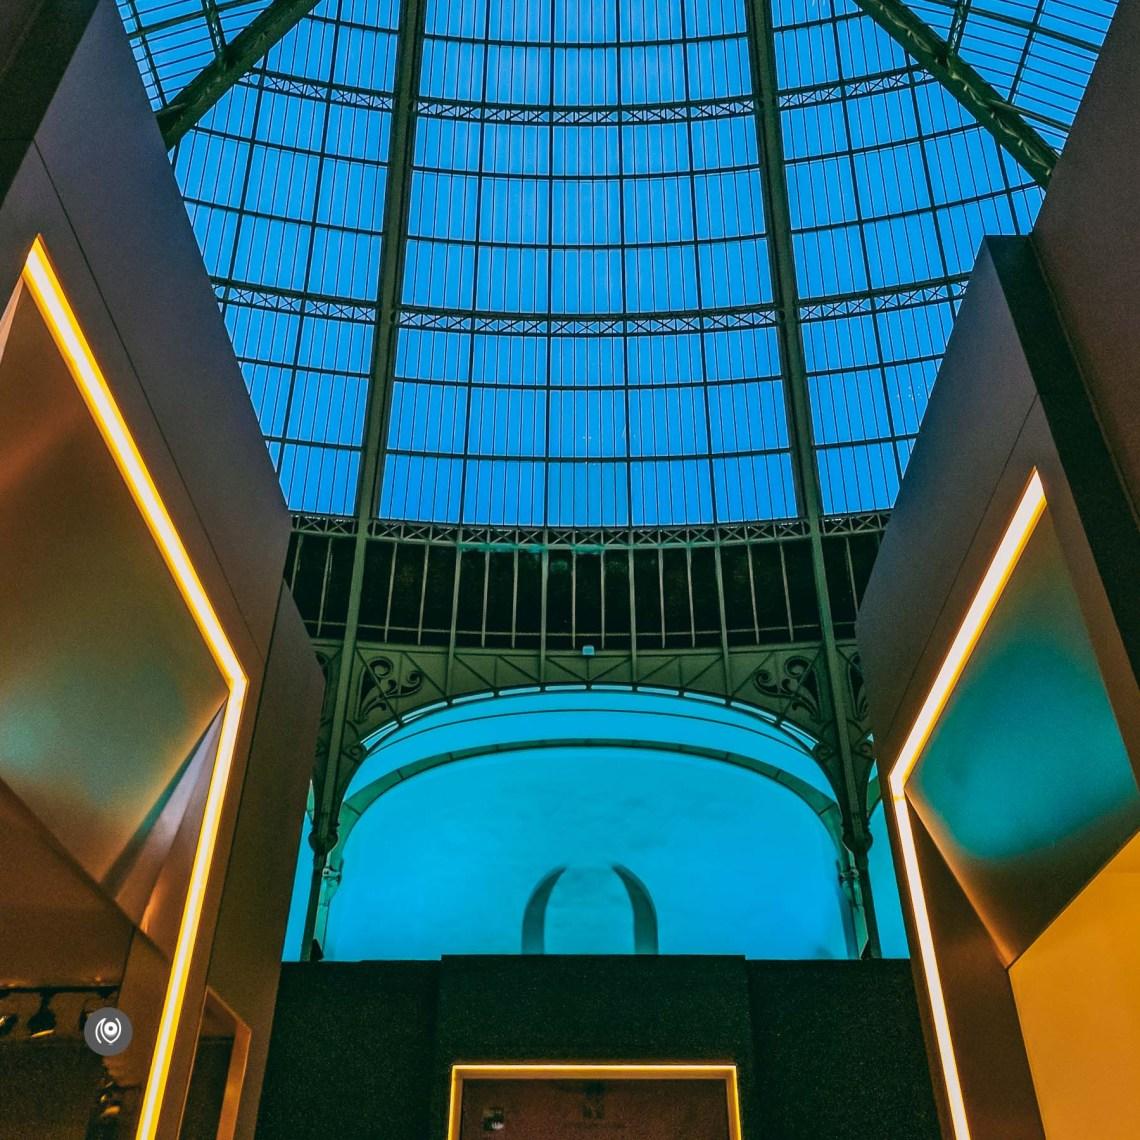 #EyesForDestinations, #EyesForLuxury, #EyesForParis, #NAINAxLaBiennaleParis, Annual, Antiques, art, art blogger, Art photographer, Artistic, Biennale, Biennale des Antiquaires, Collectors, Cultural Desitnation, Culture, Exhibitors, EyesForFrance, France, Haute Horlogerie, jewellery, La Paris Biennale, lifestyle blogger, lifestyle photographer, luxury blogger, luxury photographer, naina redhu, naina.co, Paris, Paris Biennale, The Grand Palais, travel blogger, travel photographer, Vernissage, WishBoxStudio, The Syndicat National des Antiquaires, Le Syndicate National des Antiquaires